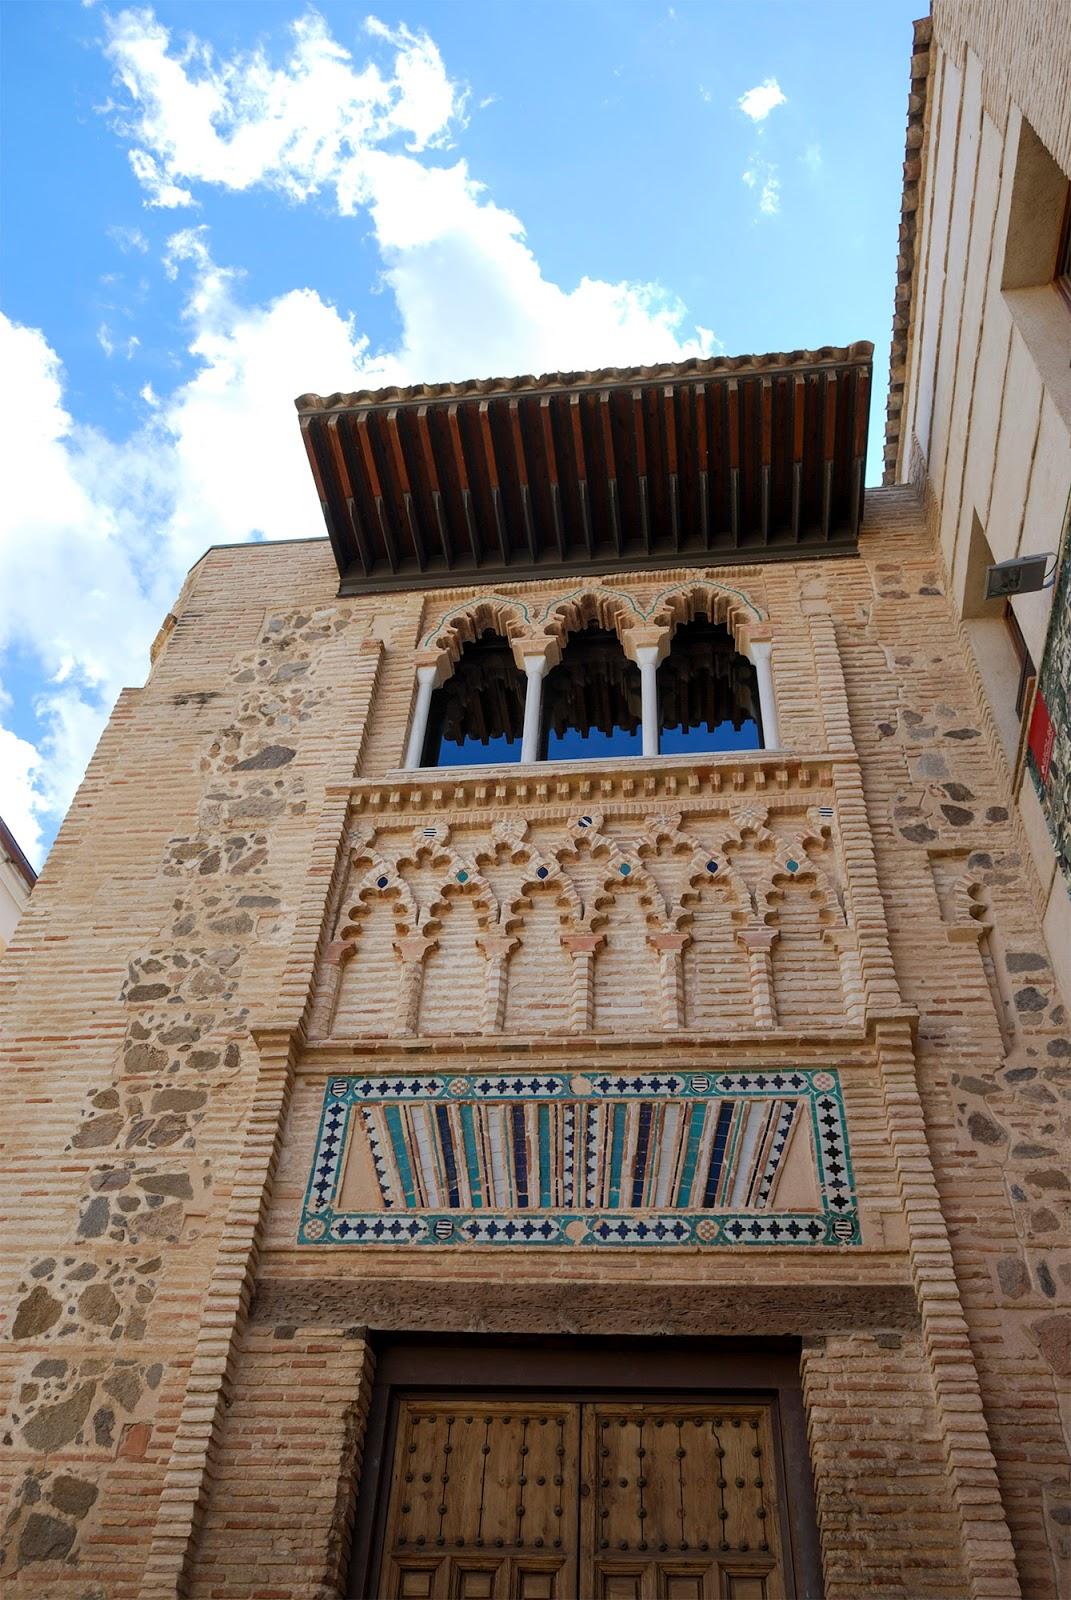 architecture mudejar moorish islamic toledo spain landmark history travel guide tourism day trip itinerary